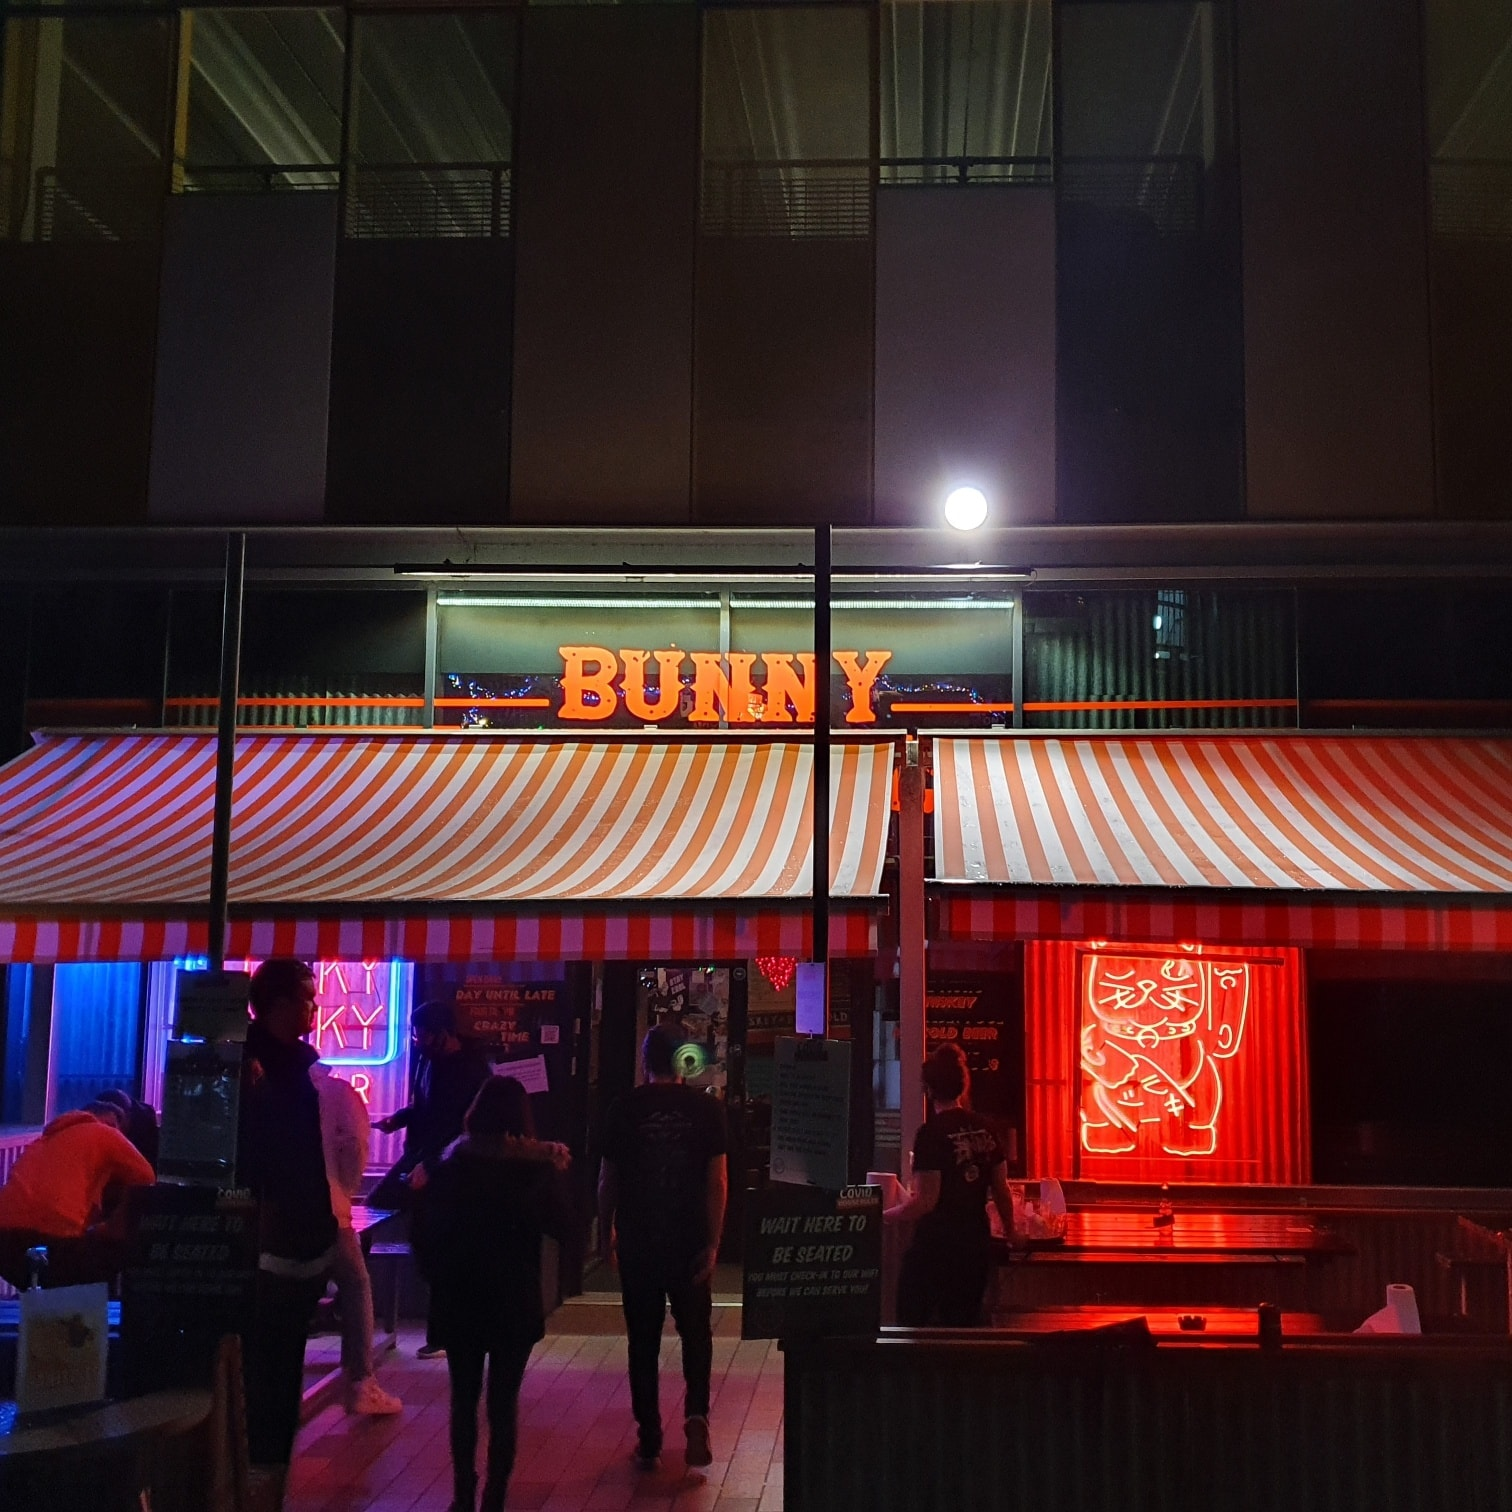 Manchester Bars - Bunny Jacksons